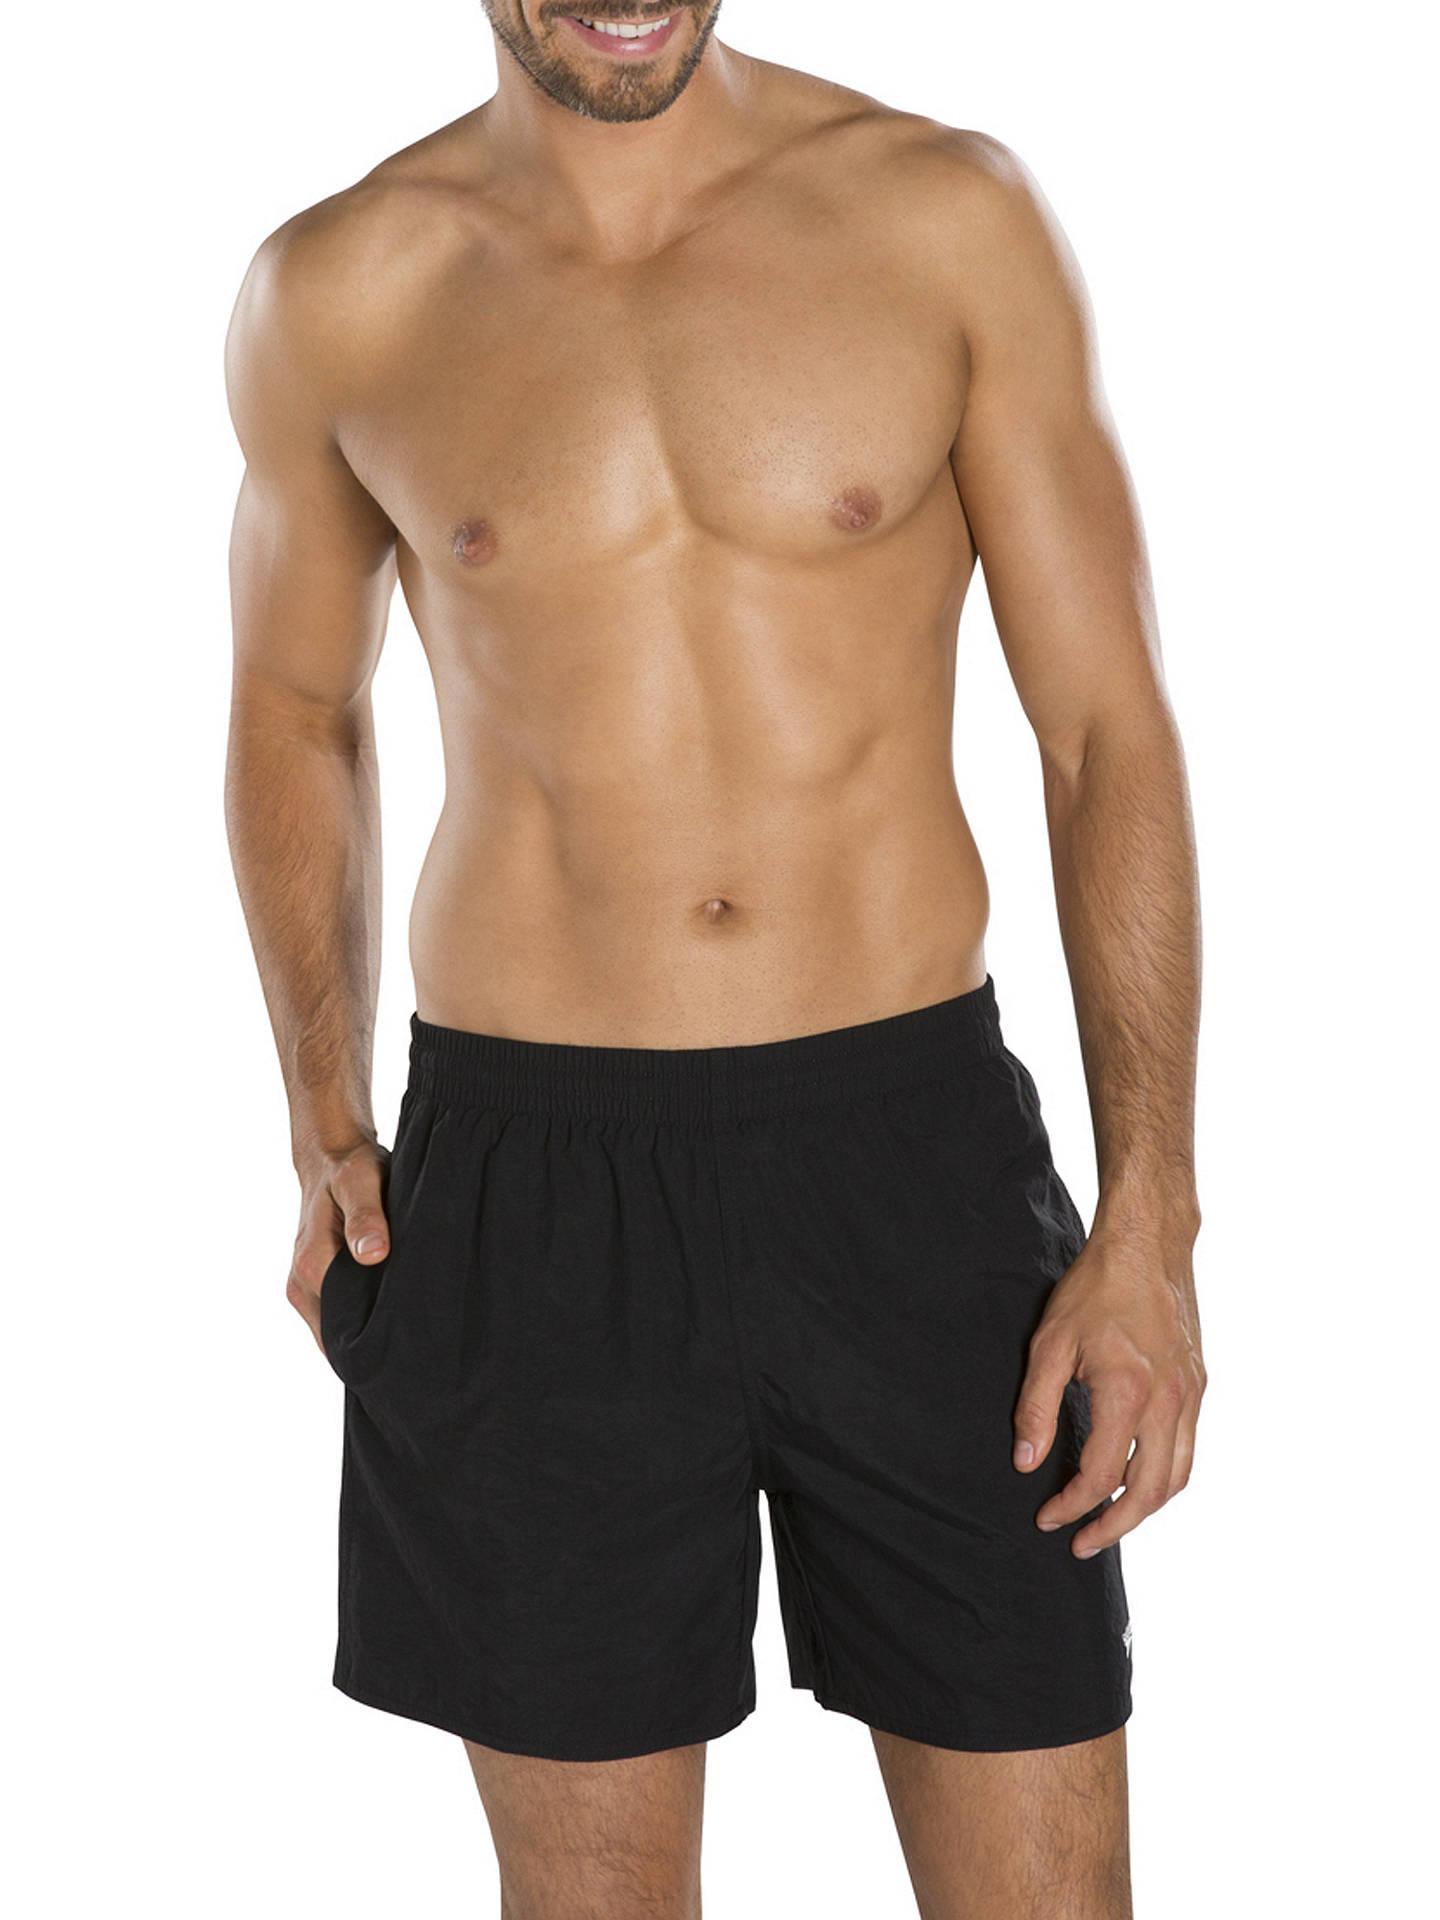 8e18e9703c8f5 Buy Speedo Solid Watershort Swim Shorts, Black, M Online at johnlewis.com  ...